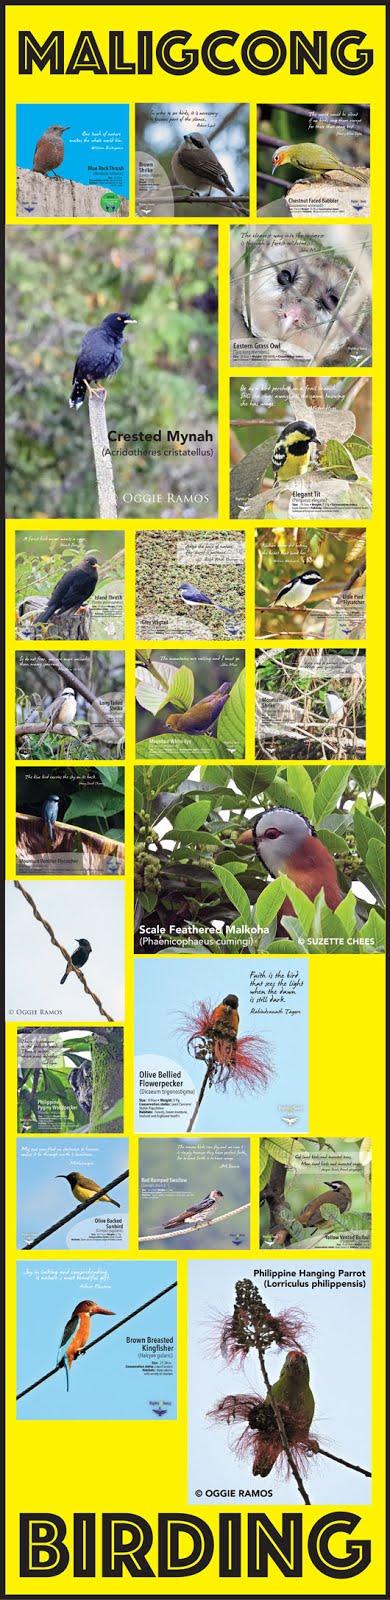 Maligcong Birding Gallery